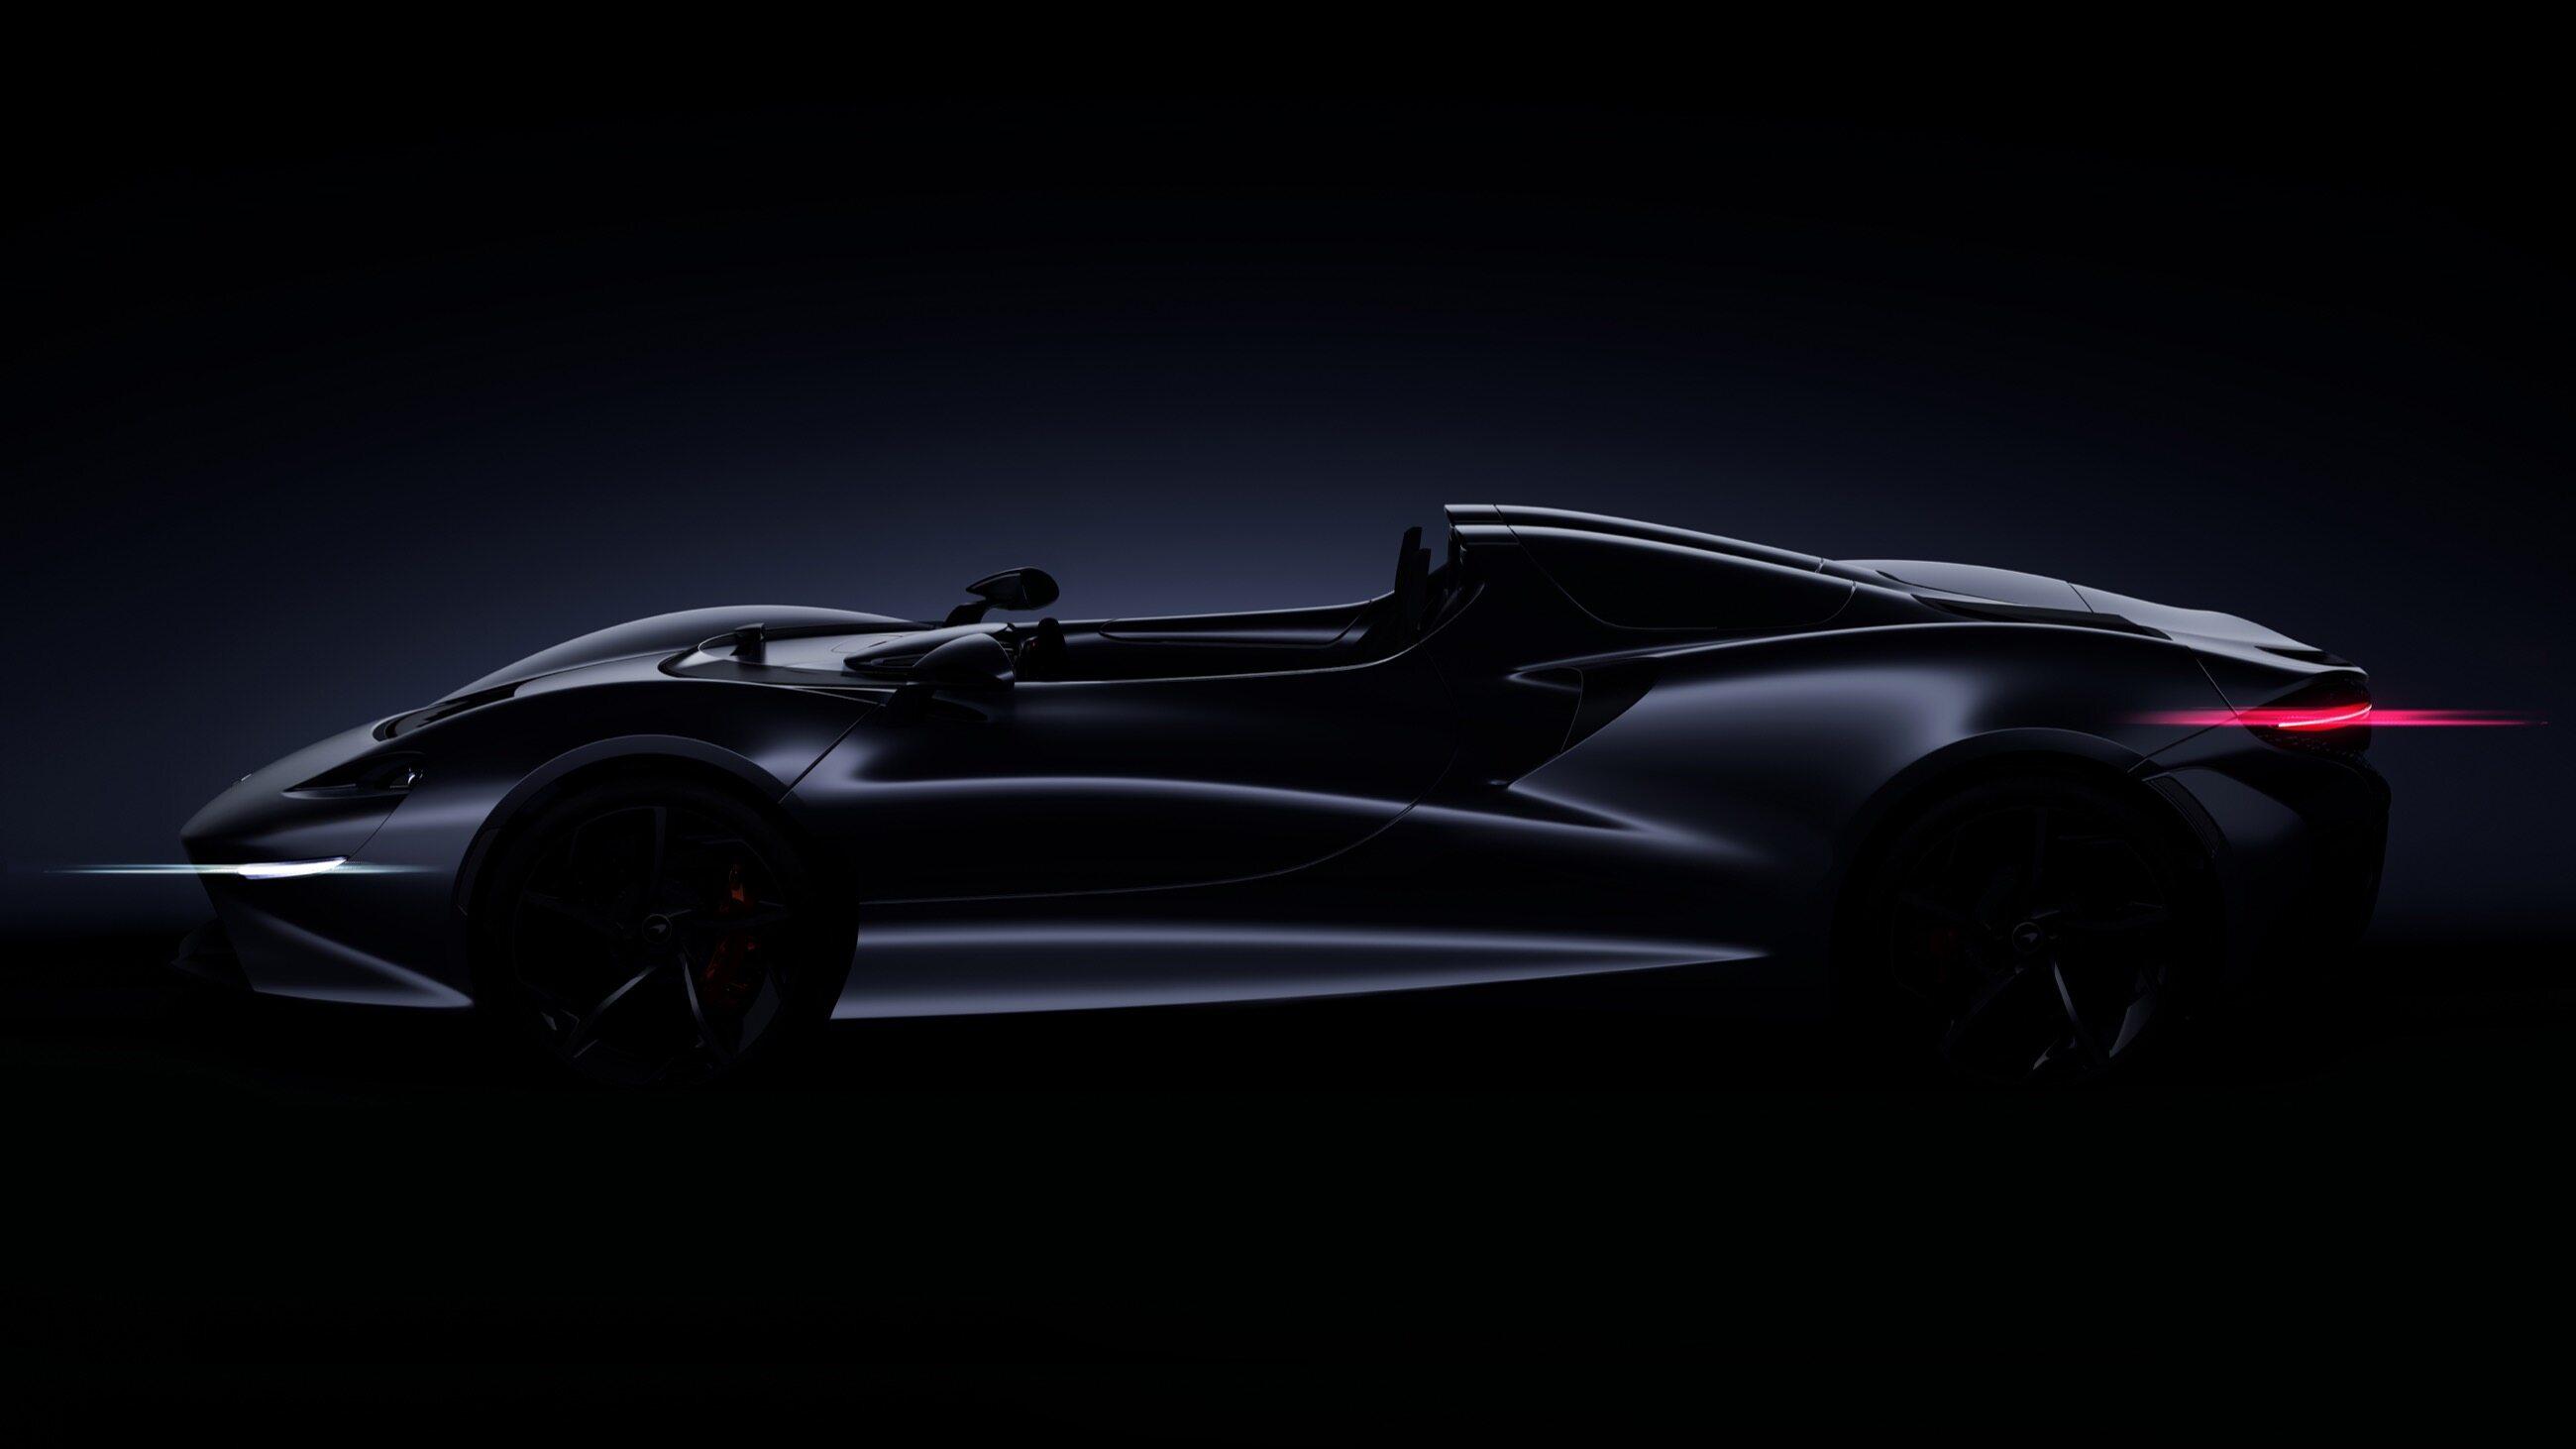 Nowy roadster McLarena z serii Ultimate